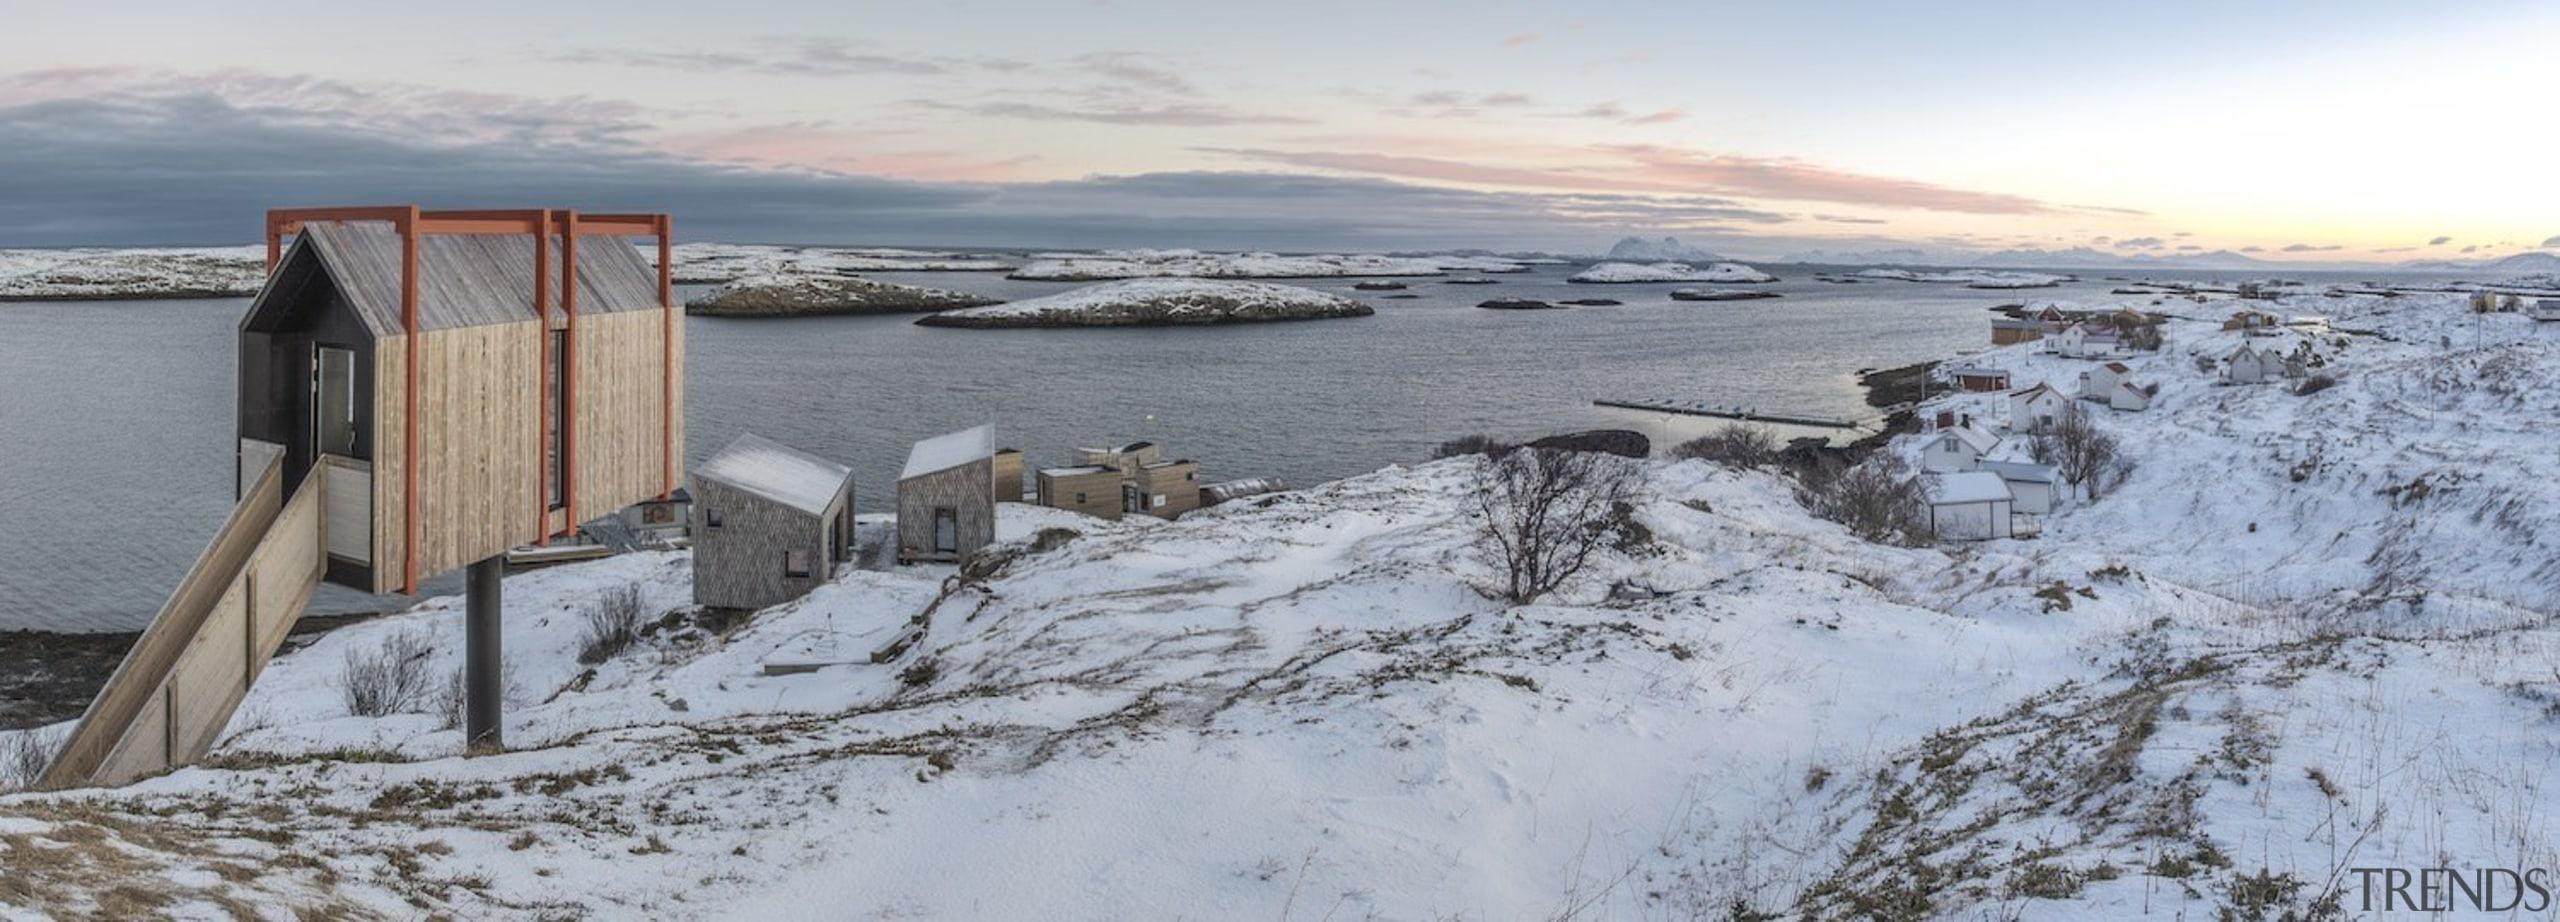 Architect: TYIN tegnestue ArchitectsPhotographer: Pasi Aalto / arctic, freezing, geological phenomenon, ice, sky, snow, winter, wood, gray